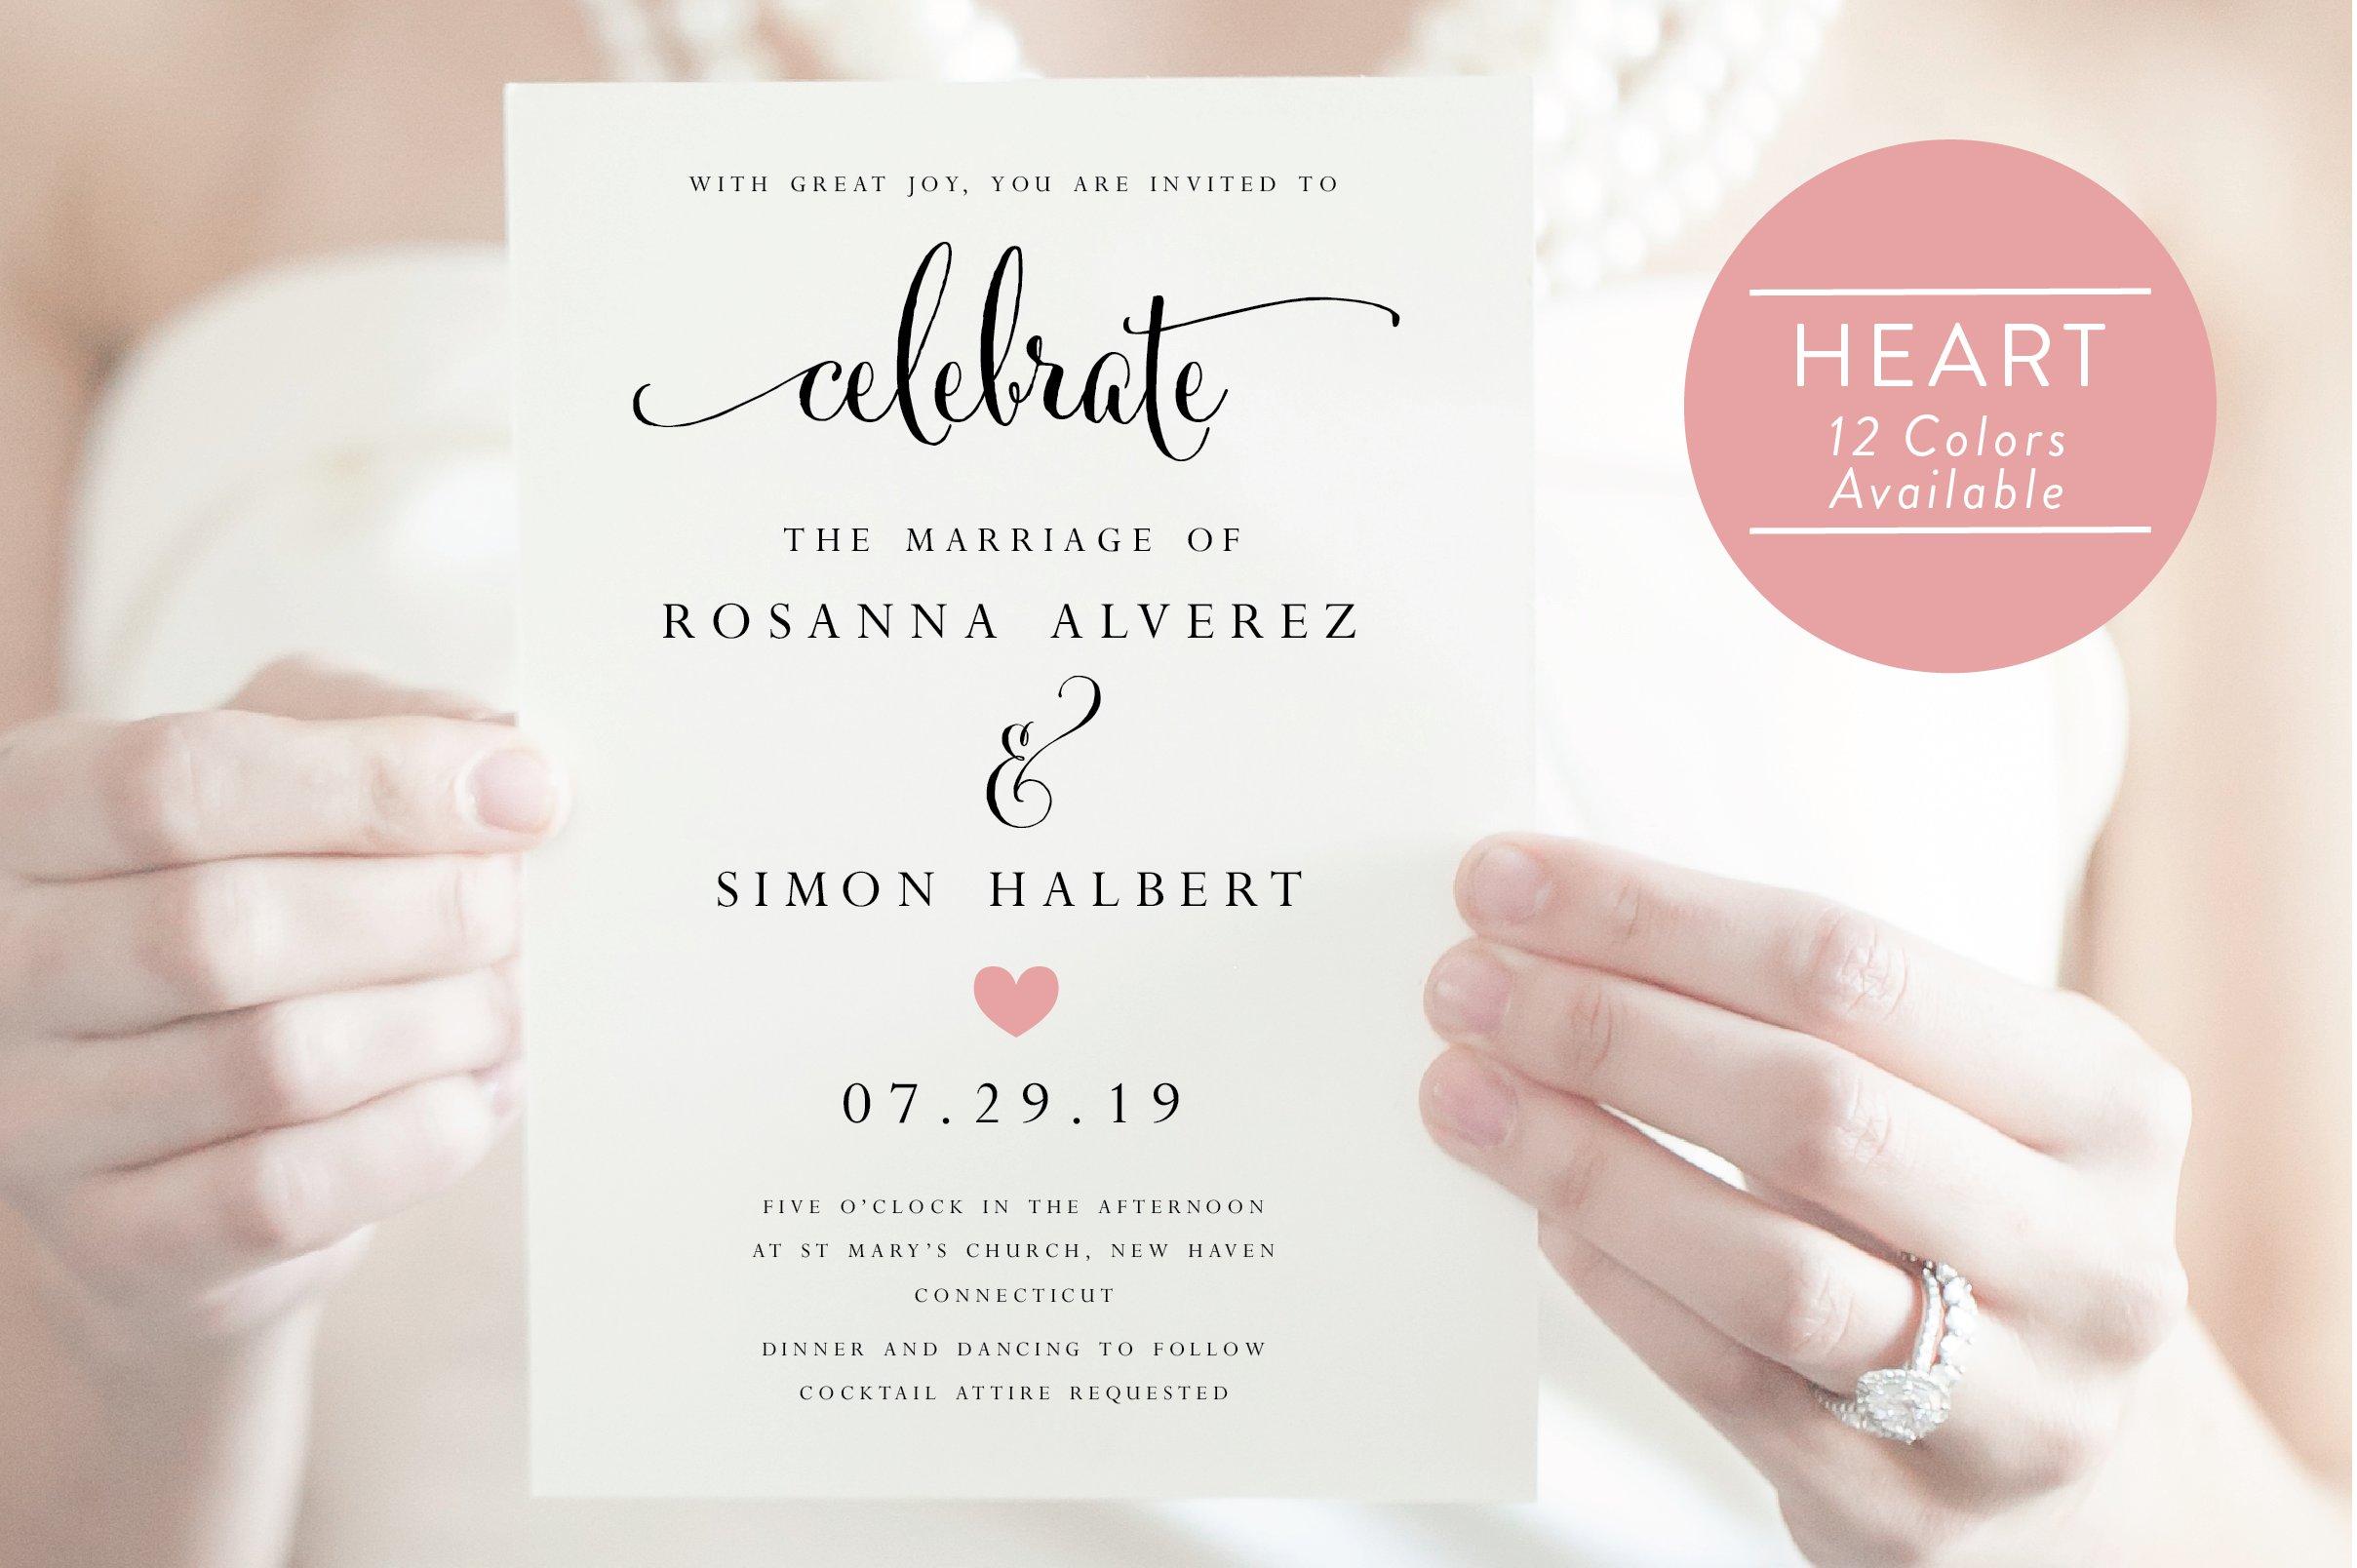 Wedding E Invitation Templates: Wedding Invitation